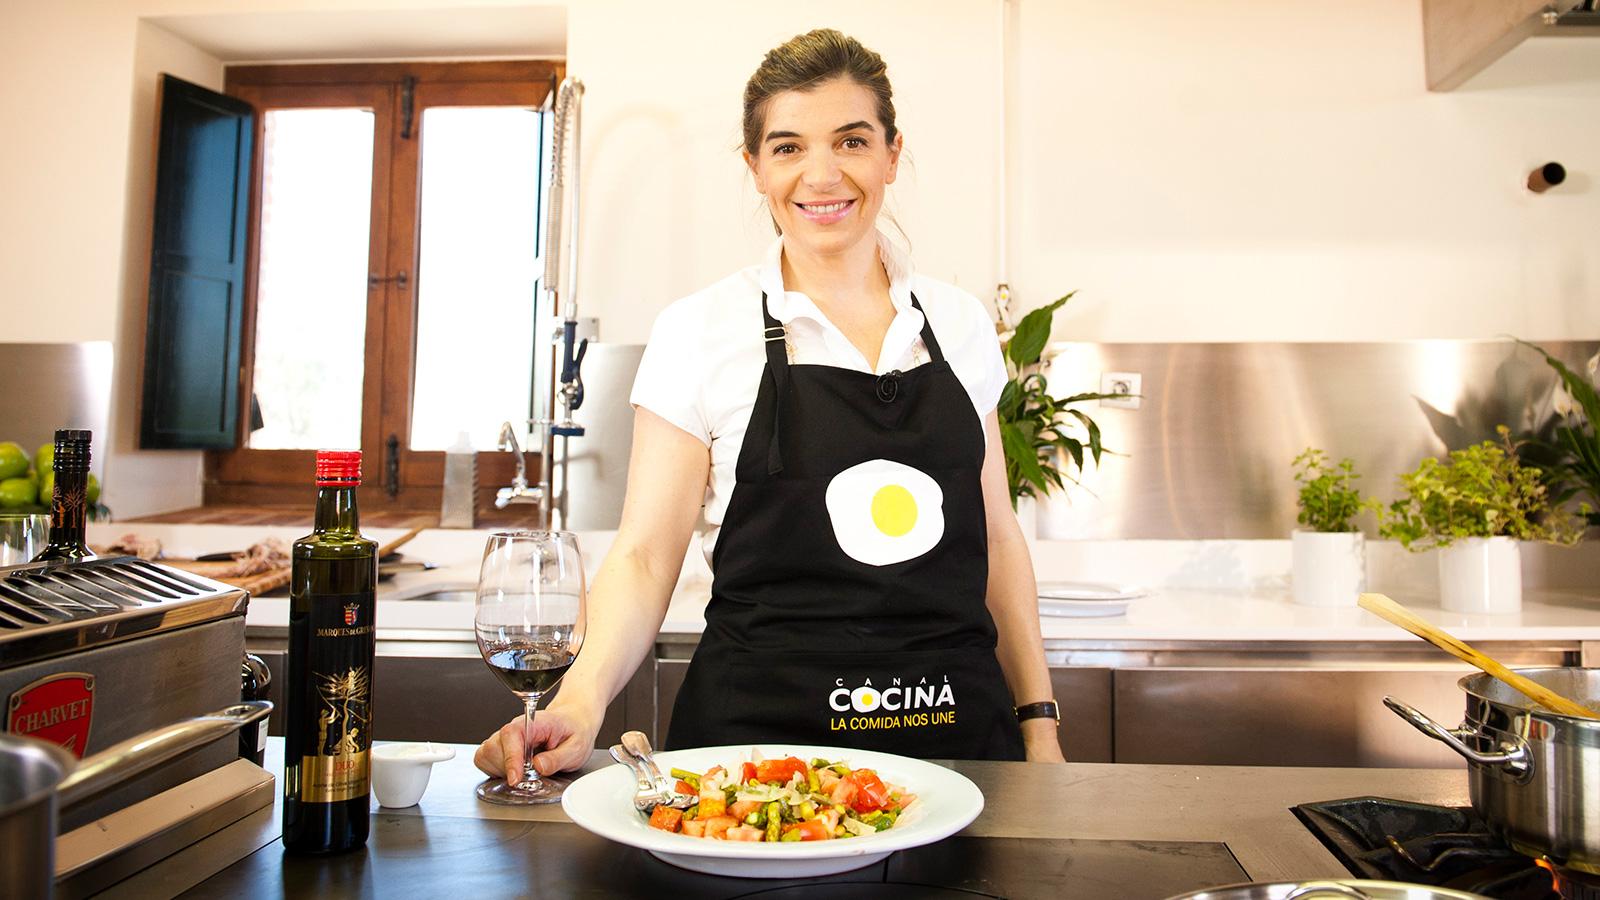 Xandra falc cocineros canal cocina - Canal cocina cocineros ...